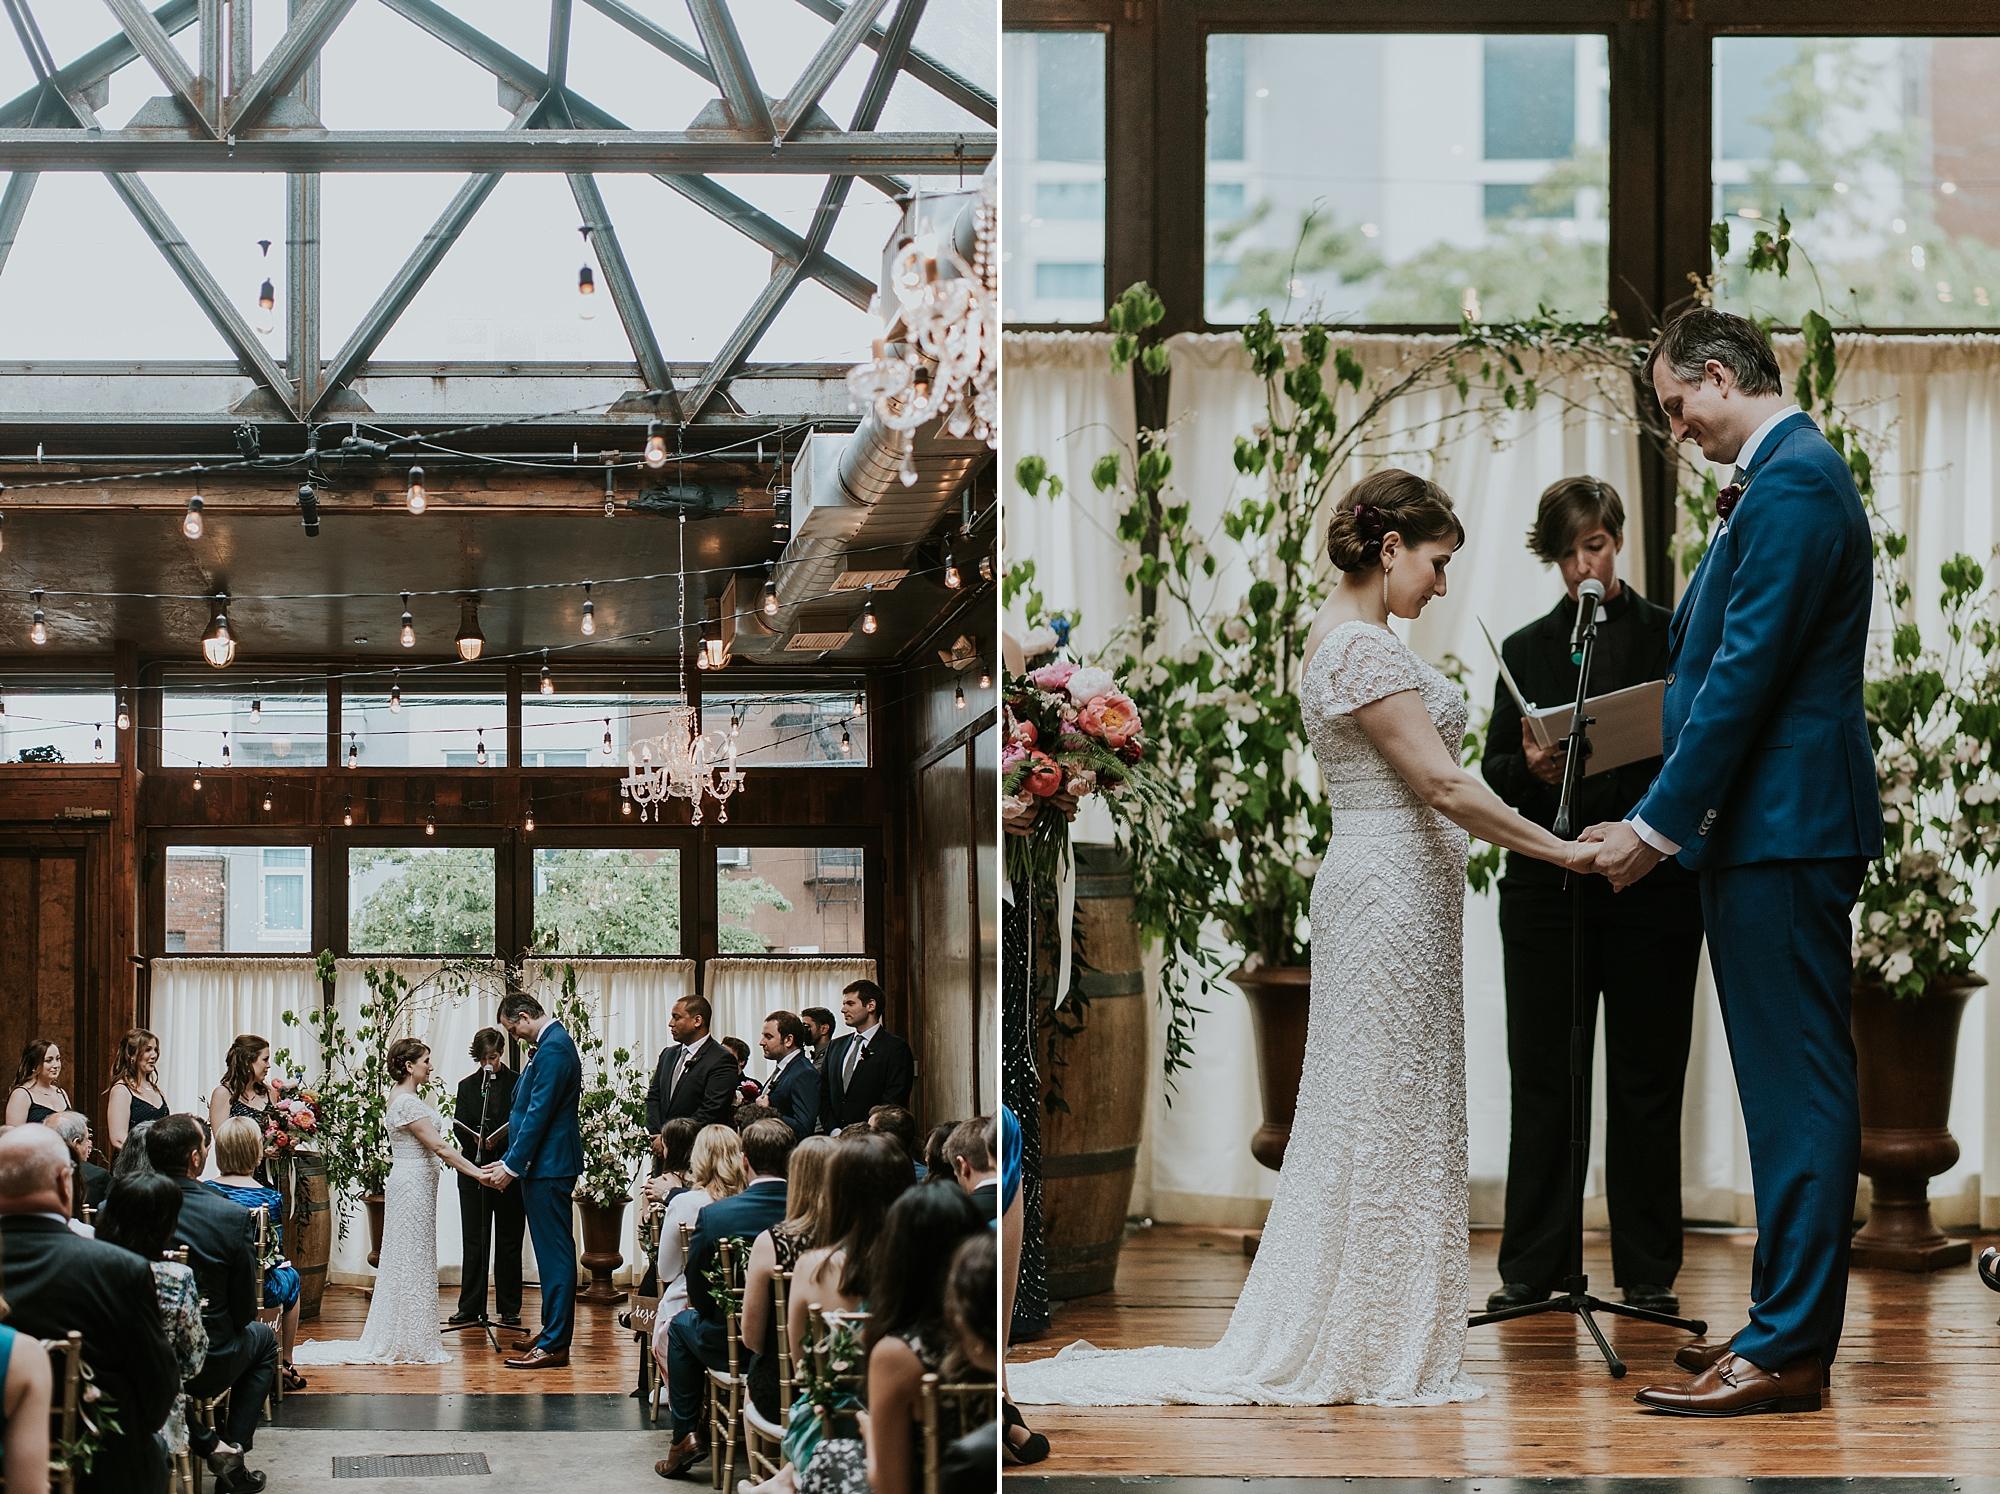 Brooklyn Winery Wedding.Jessica Nik Brooklyn Winery Wedding M2 Photo